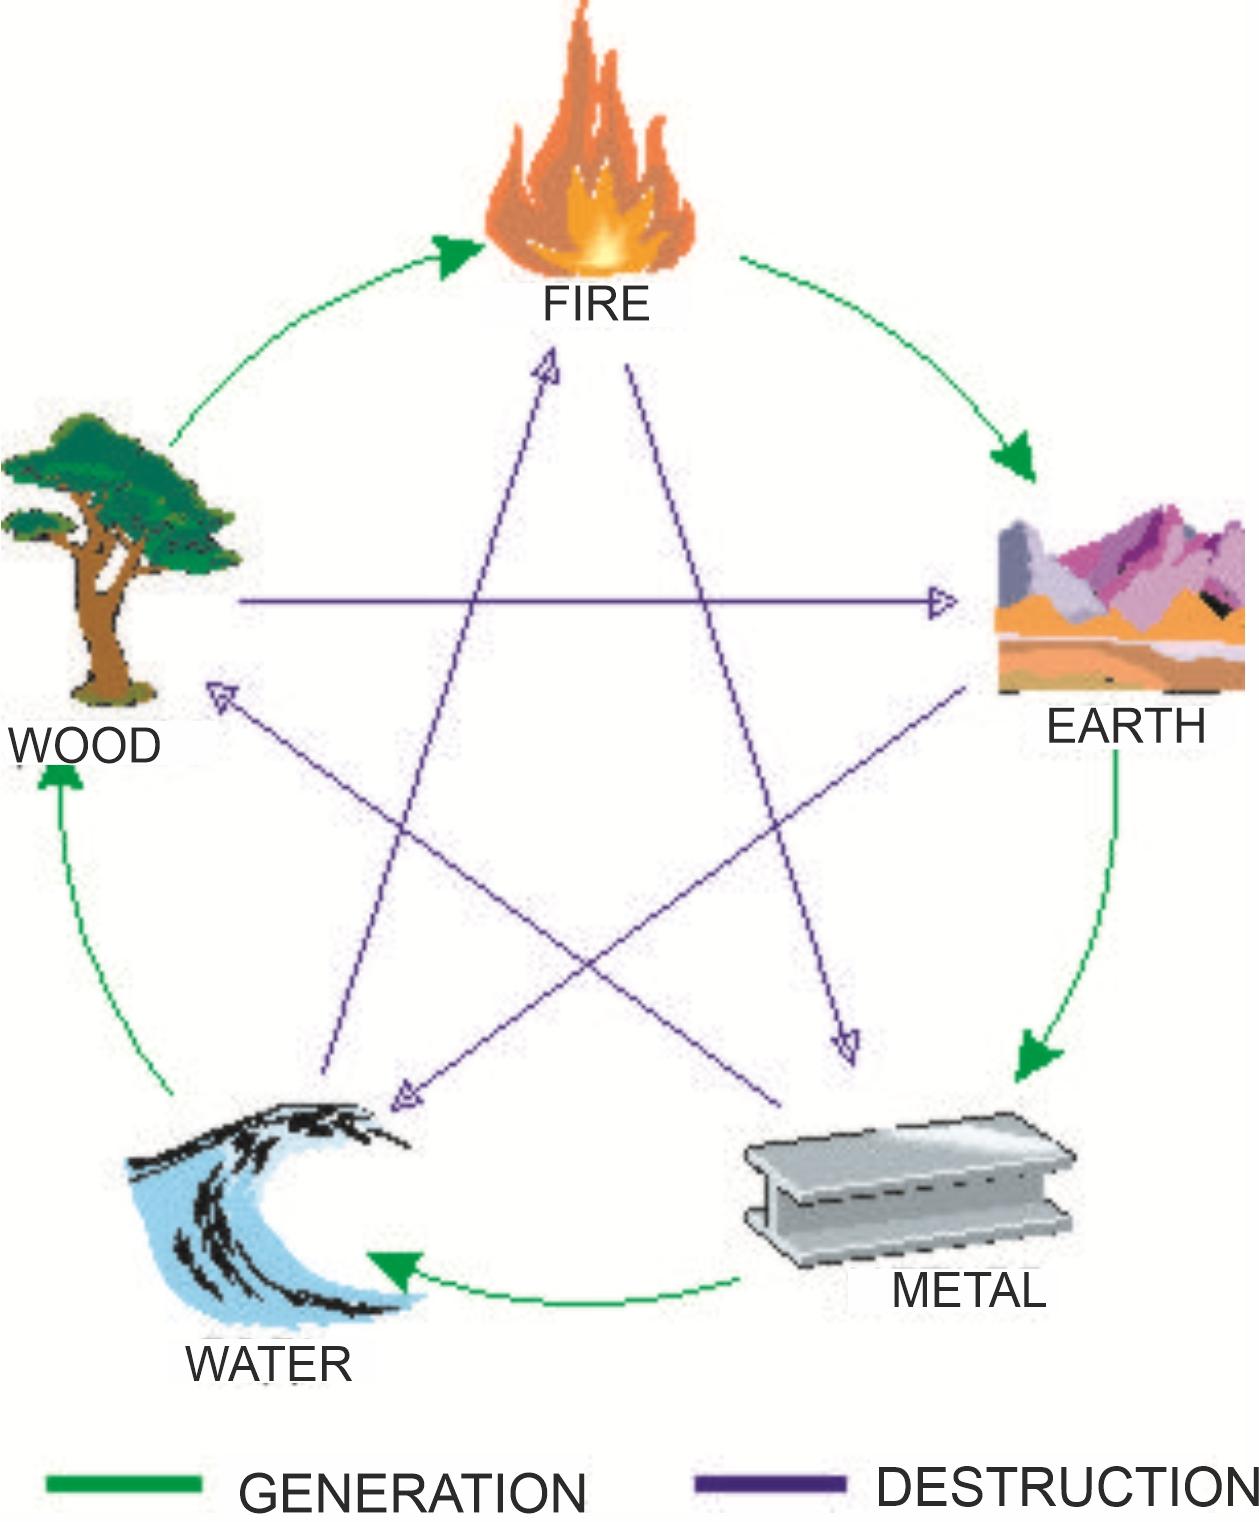 relationship between generation and destruction between the primary elements